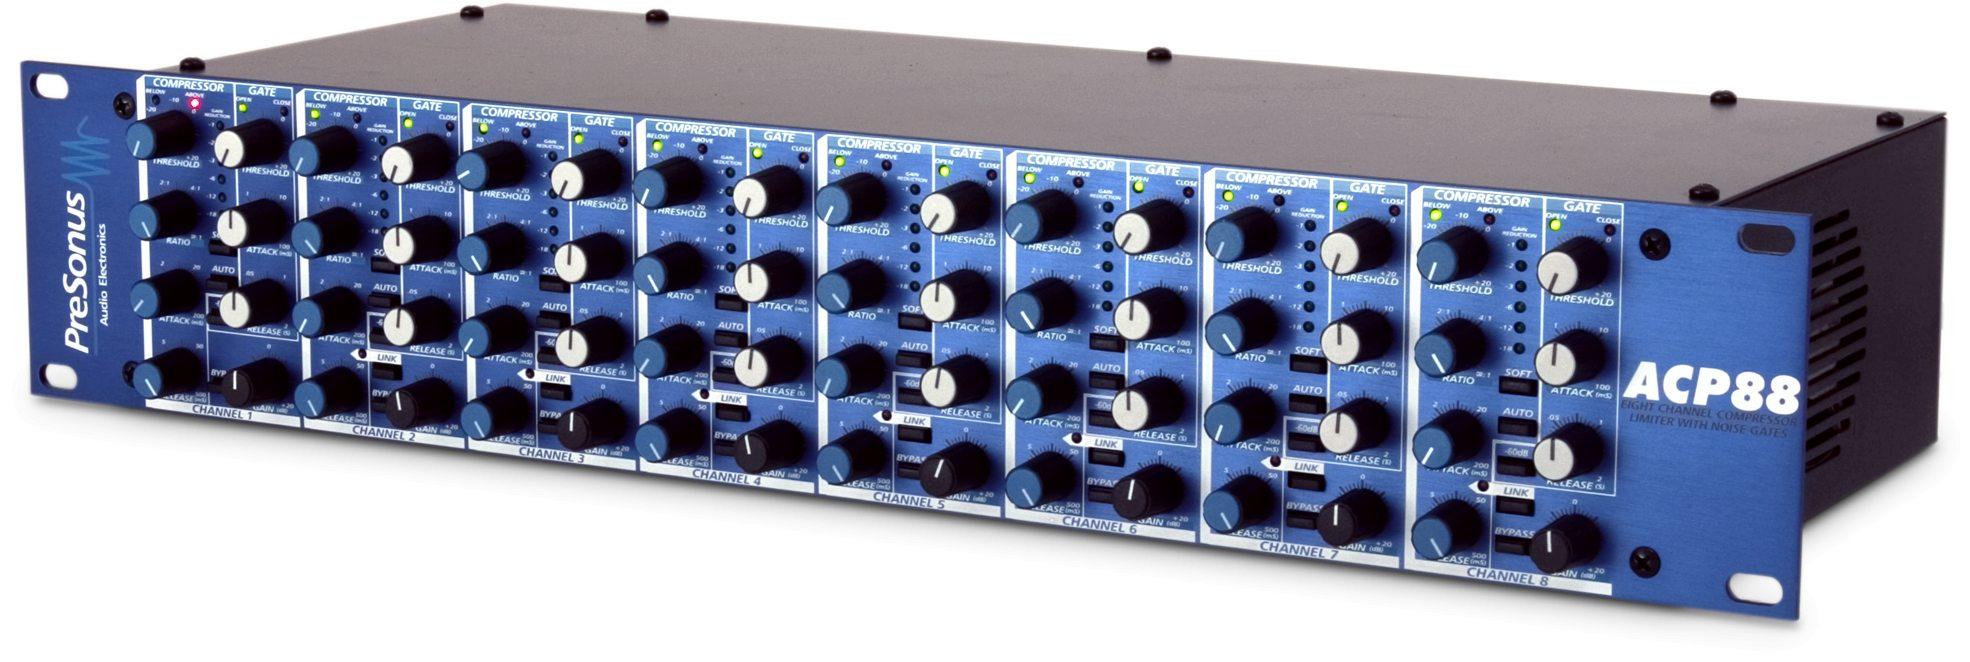 PRESONUS ACP88 COMPRESSOR/LIMITER/GATE